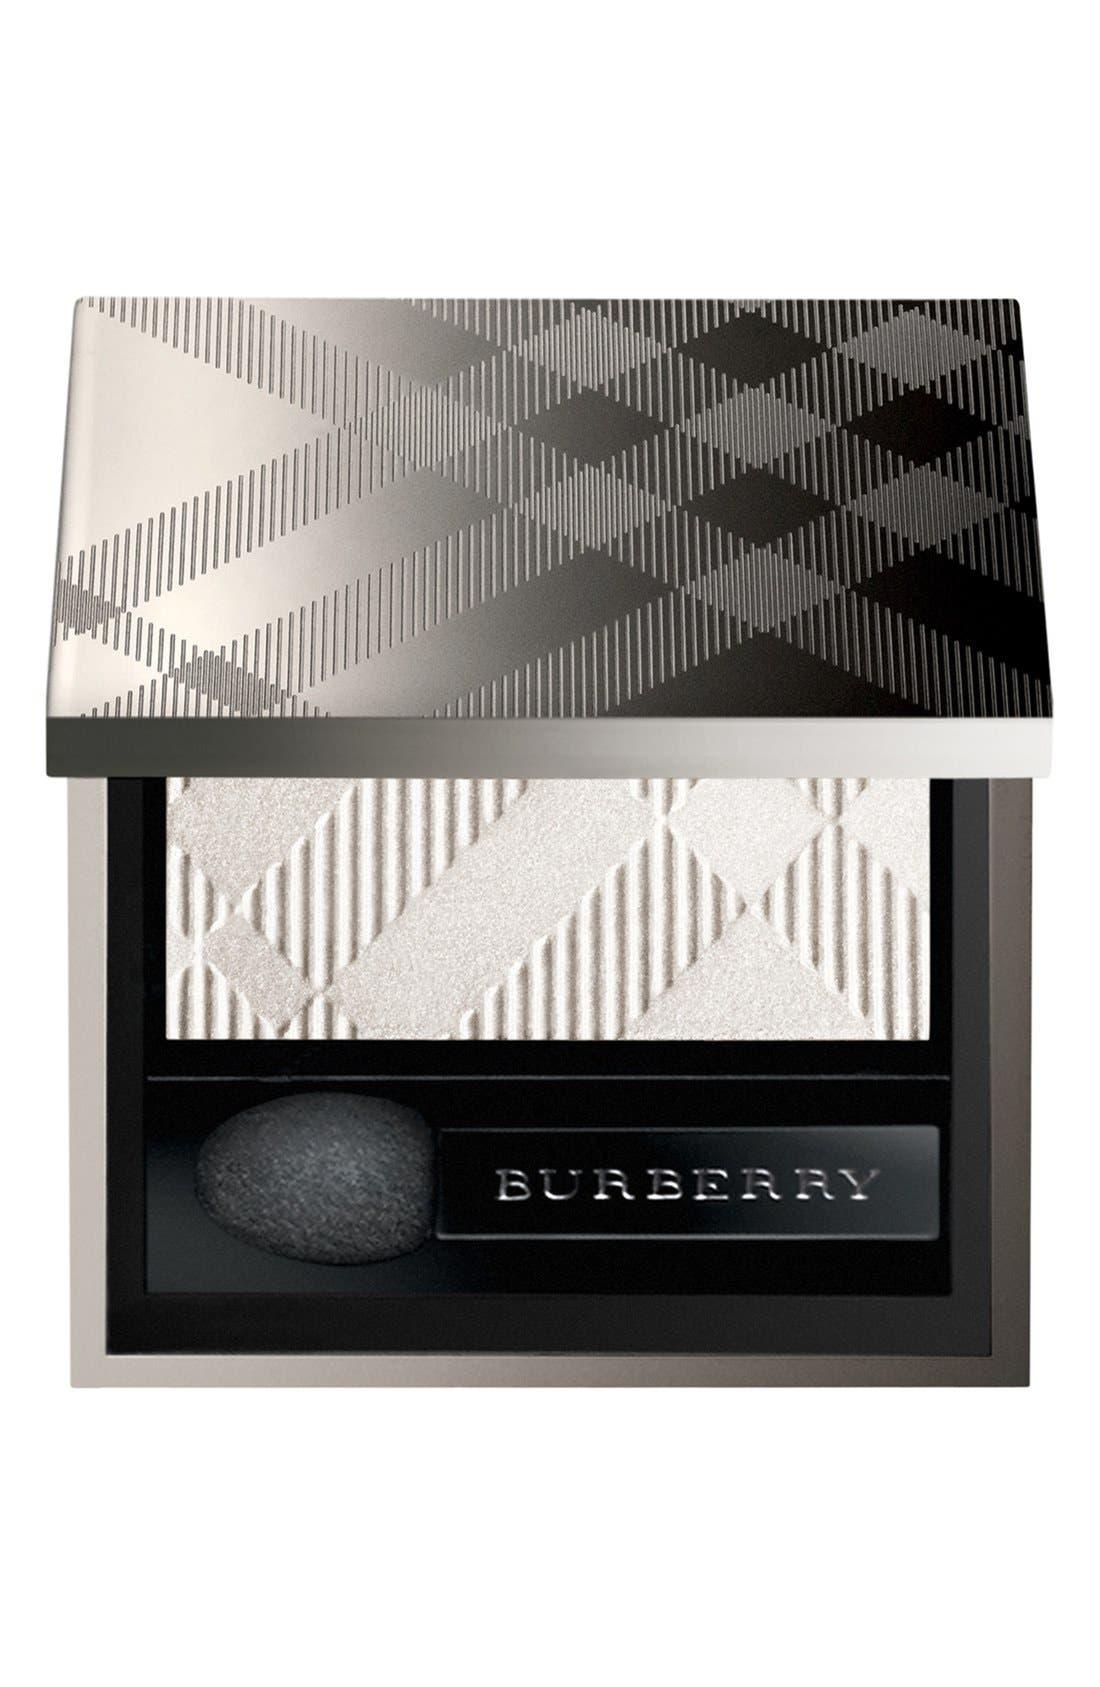 BURBERRY BEAUTY Eye Colour - Wet & Dry Glow Eyeshadow, Main, color, 100